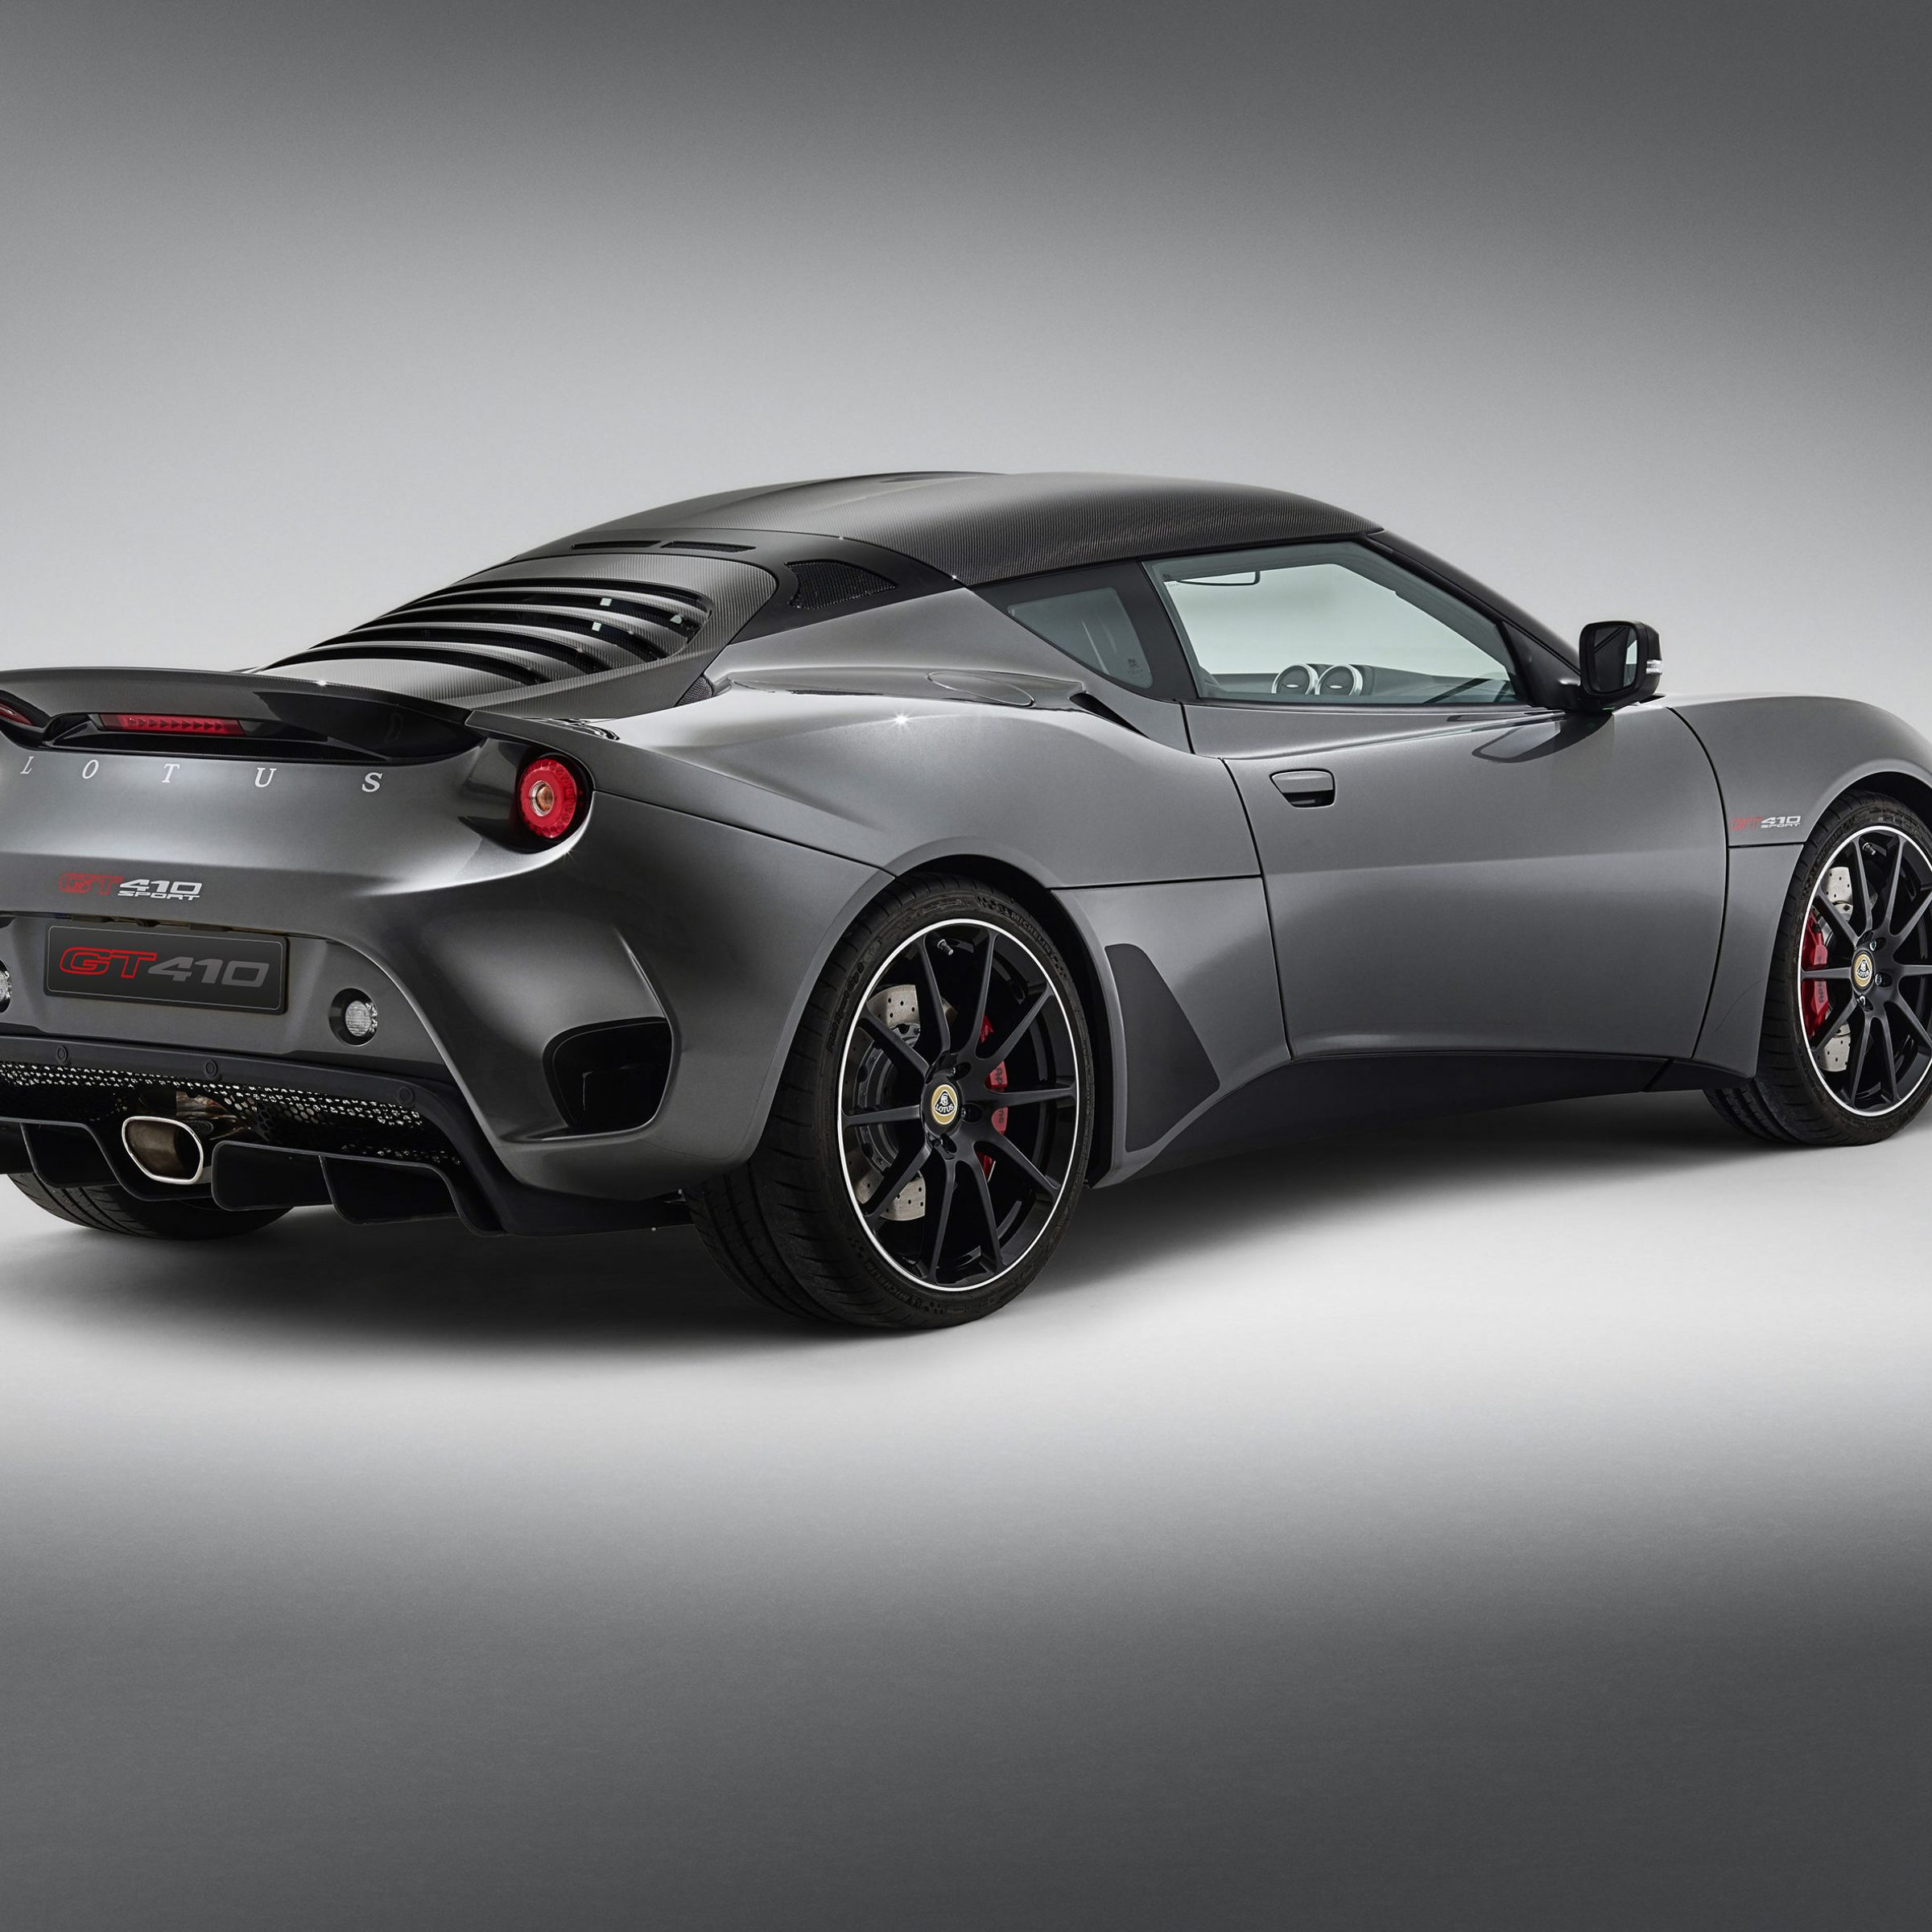 The Evora GT410 Sport